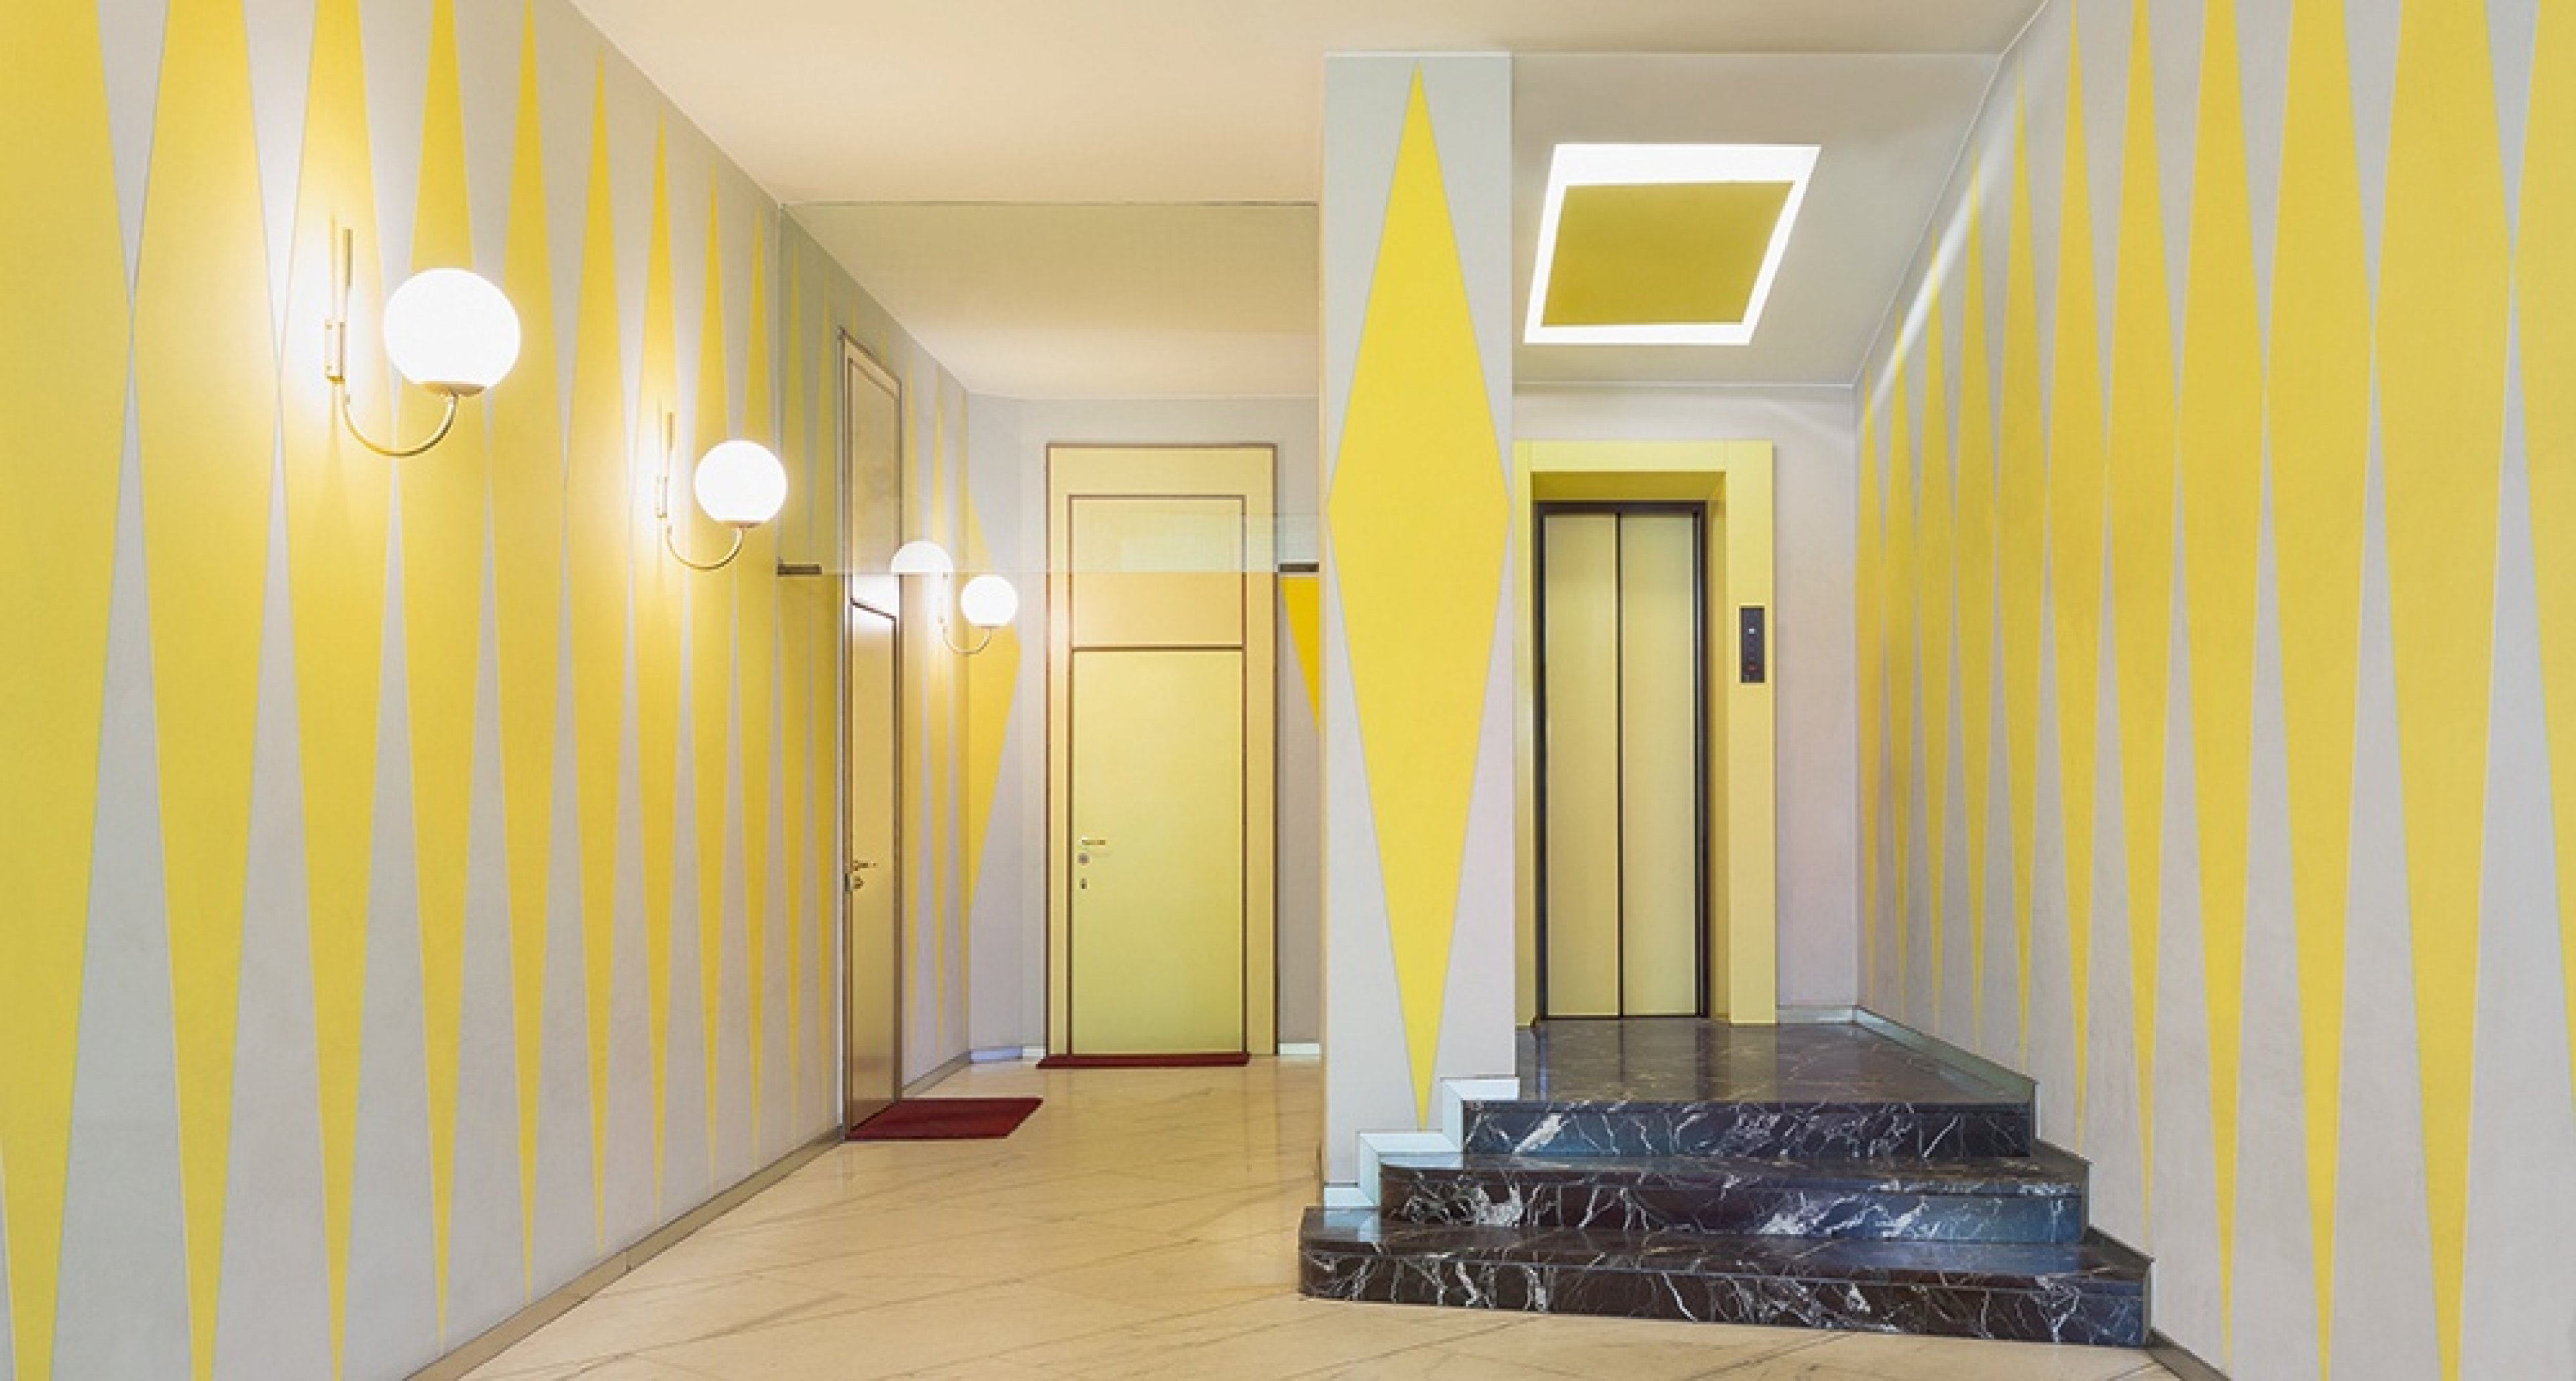 Casa Melandri, Gio Ponti, Alberto Rosselli, 1954–57. © Delfino Sisto Legnani